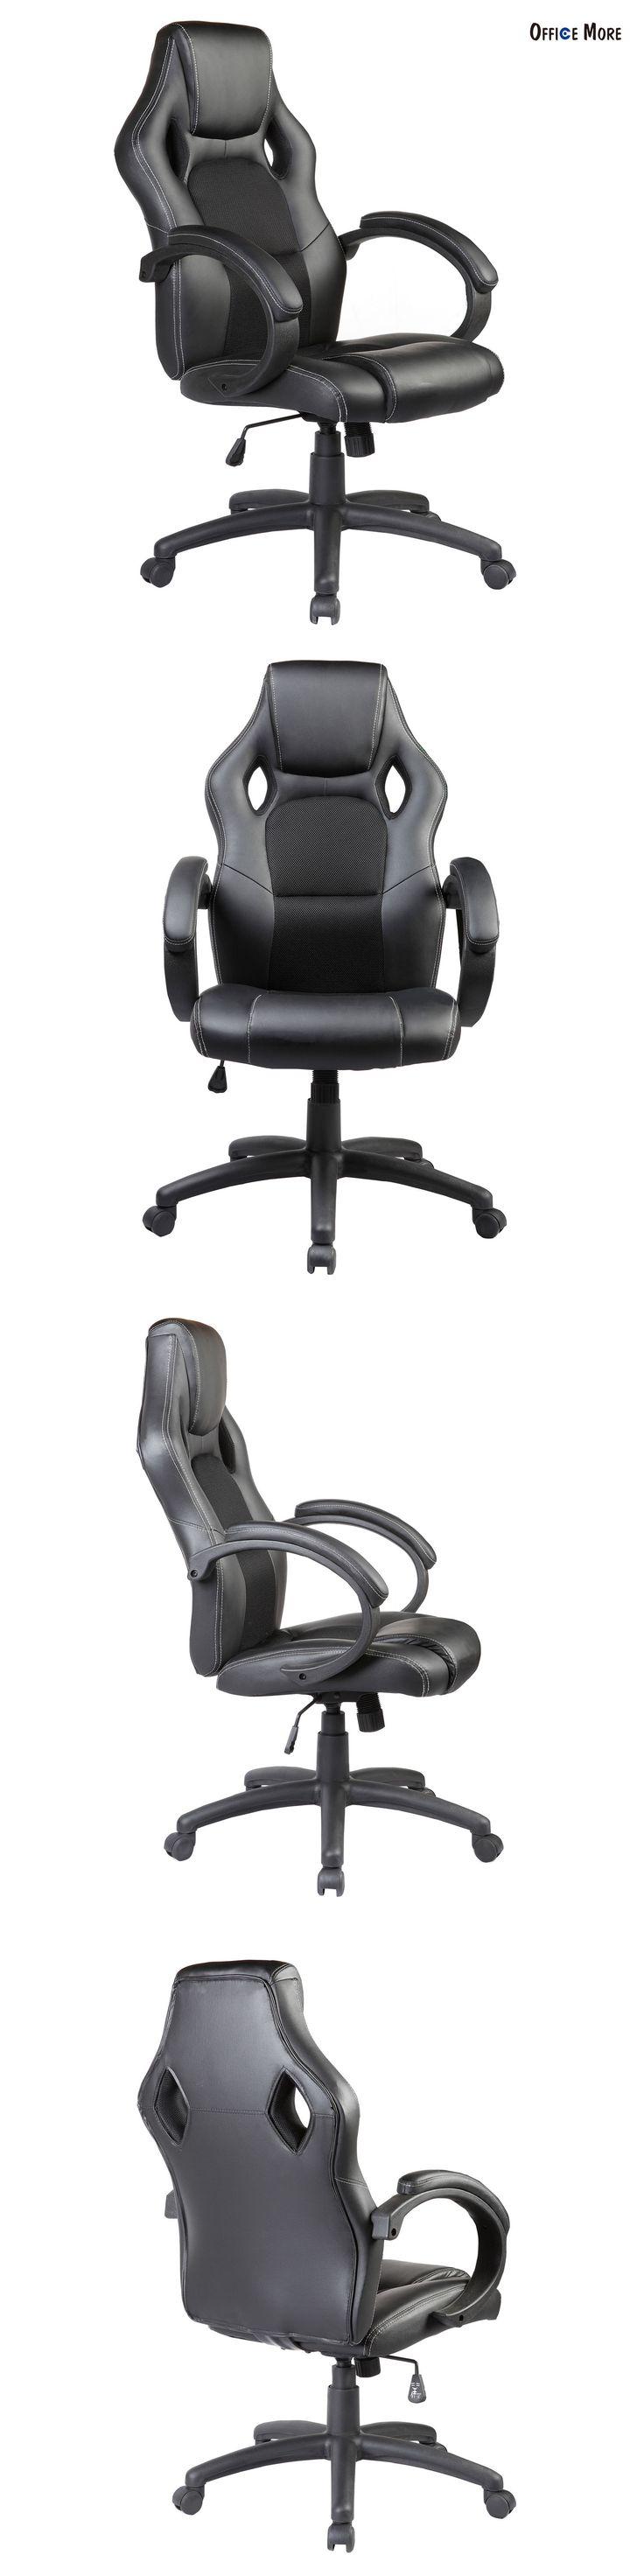 Best 25 Buy office chair ideas on Pinterest Office workouts